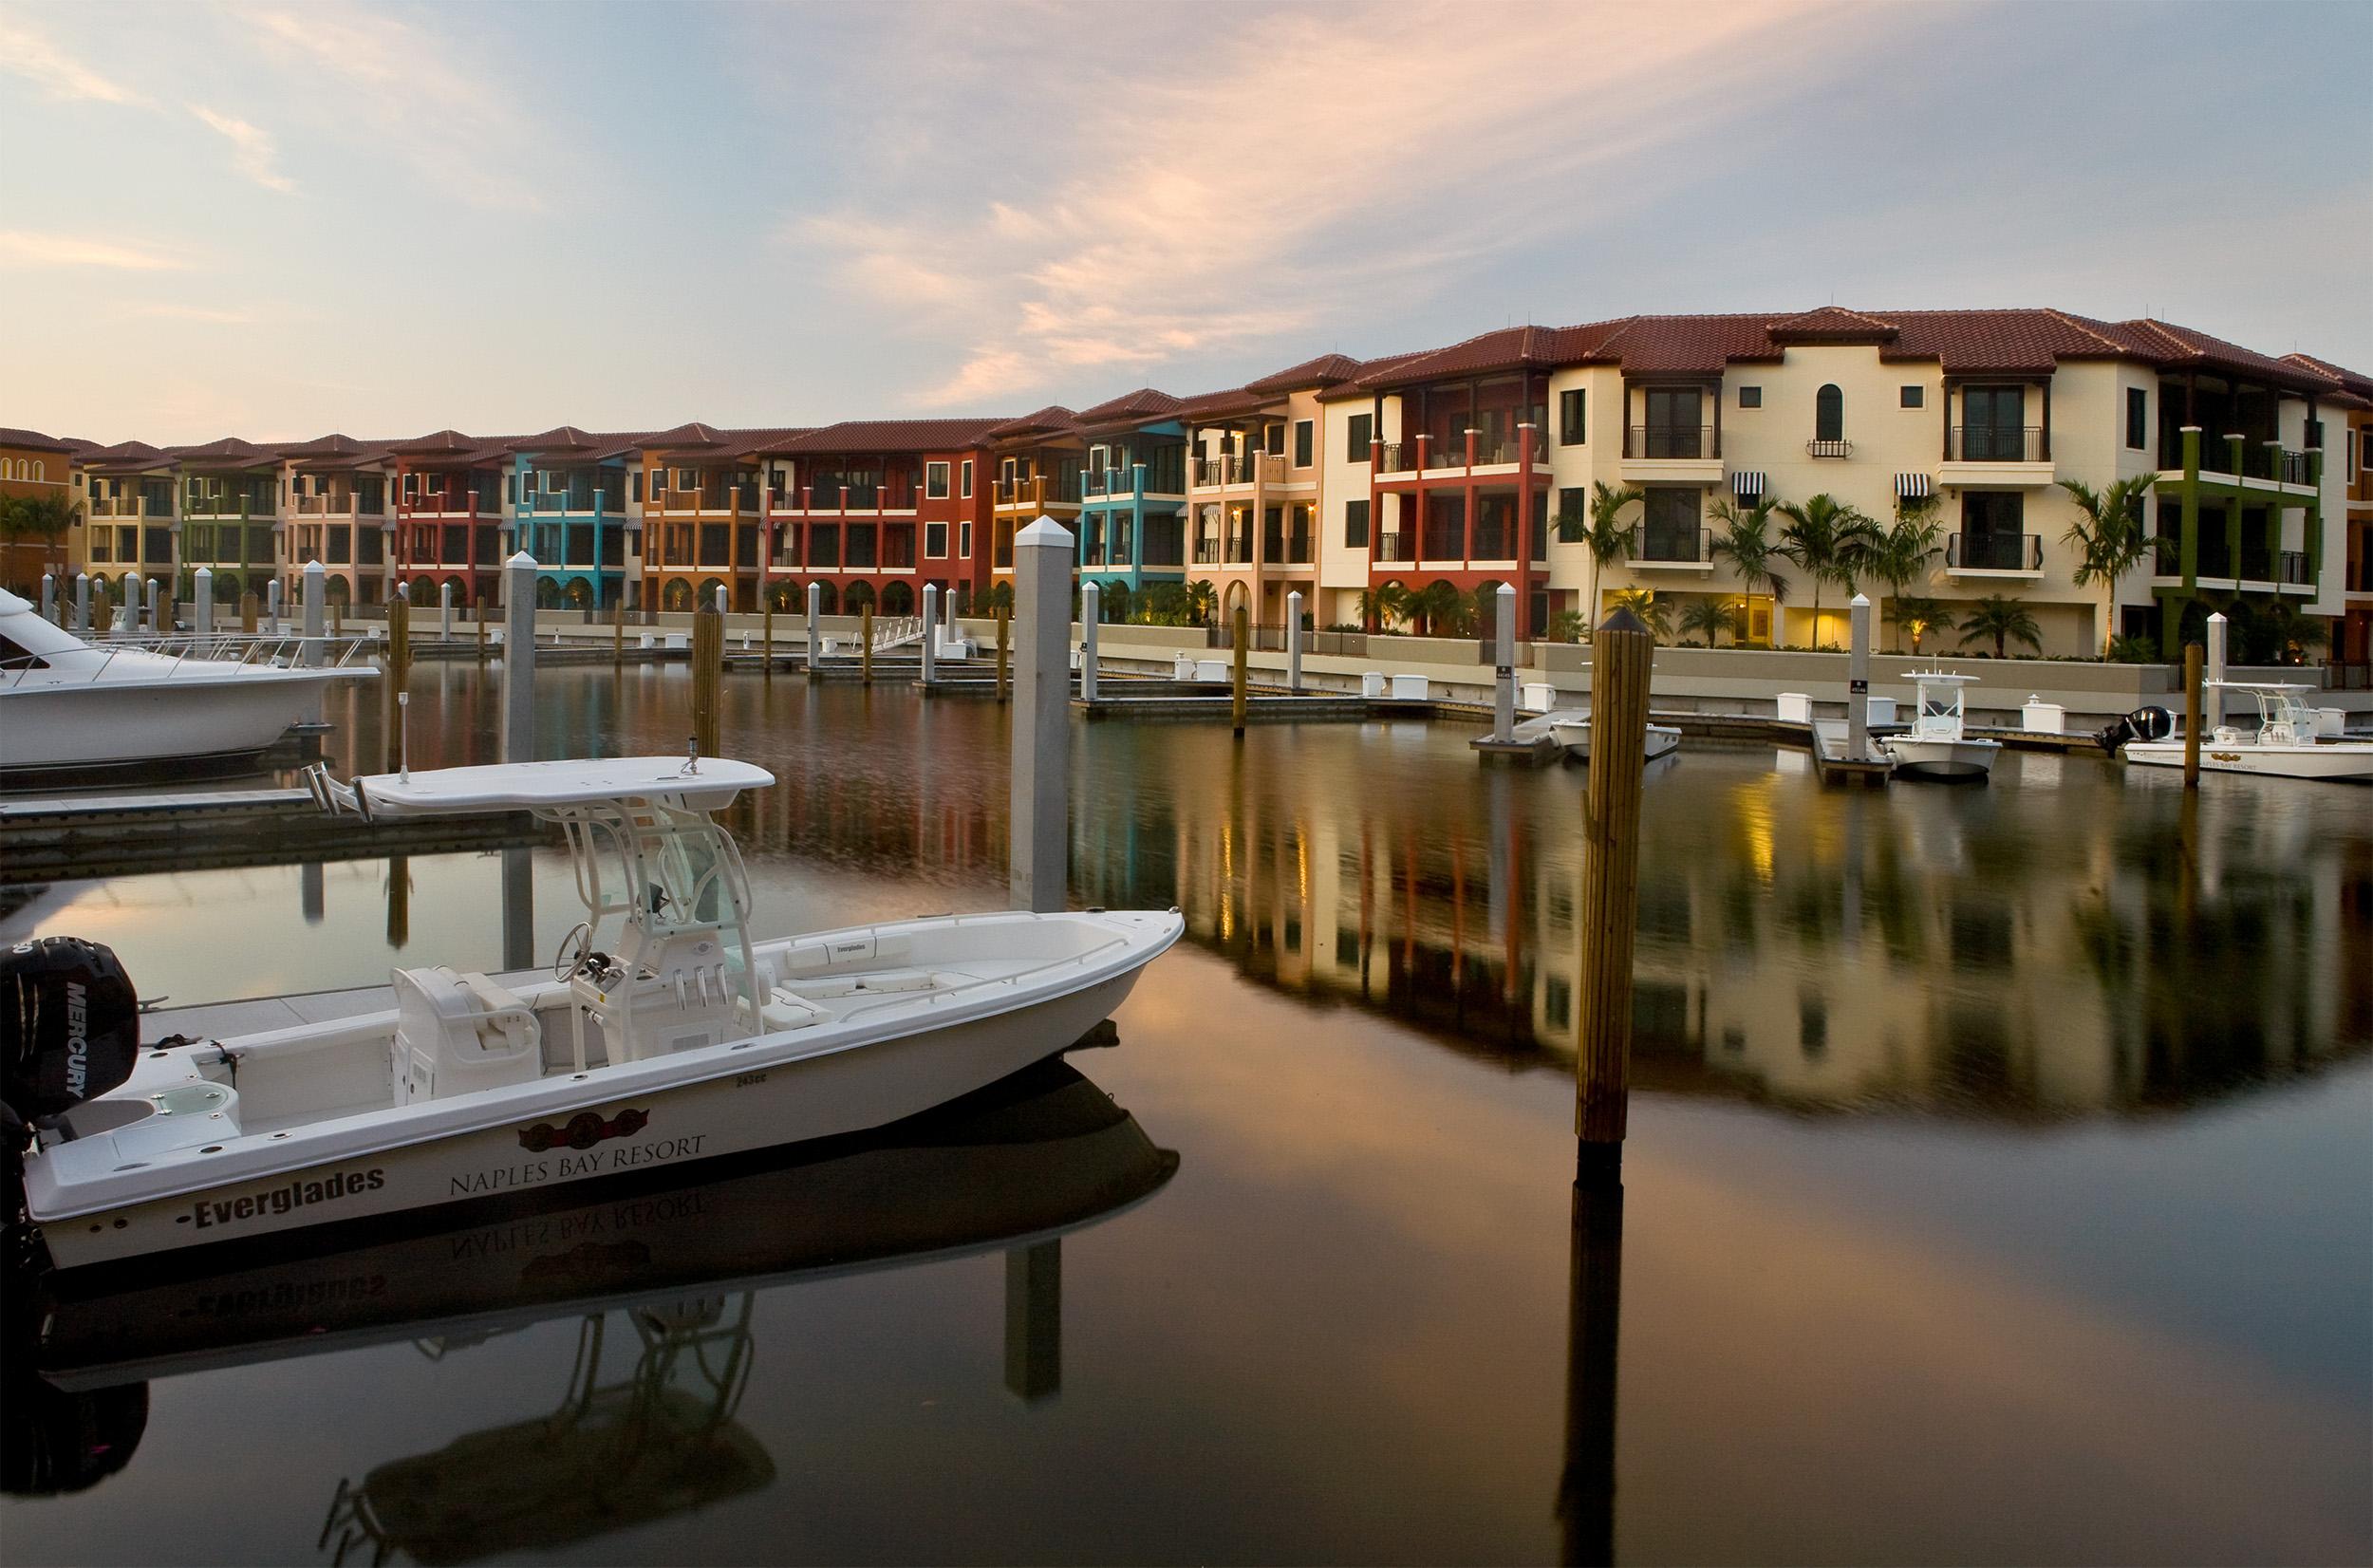 Naples Bay Resort - Residences